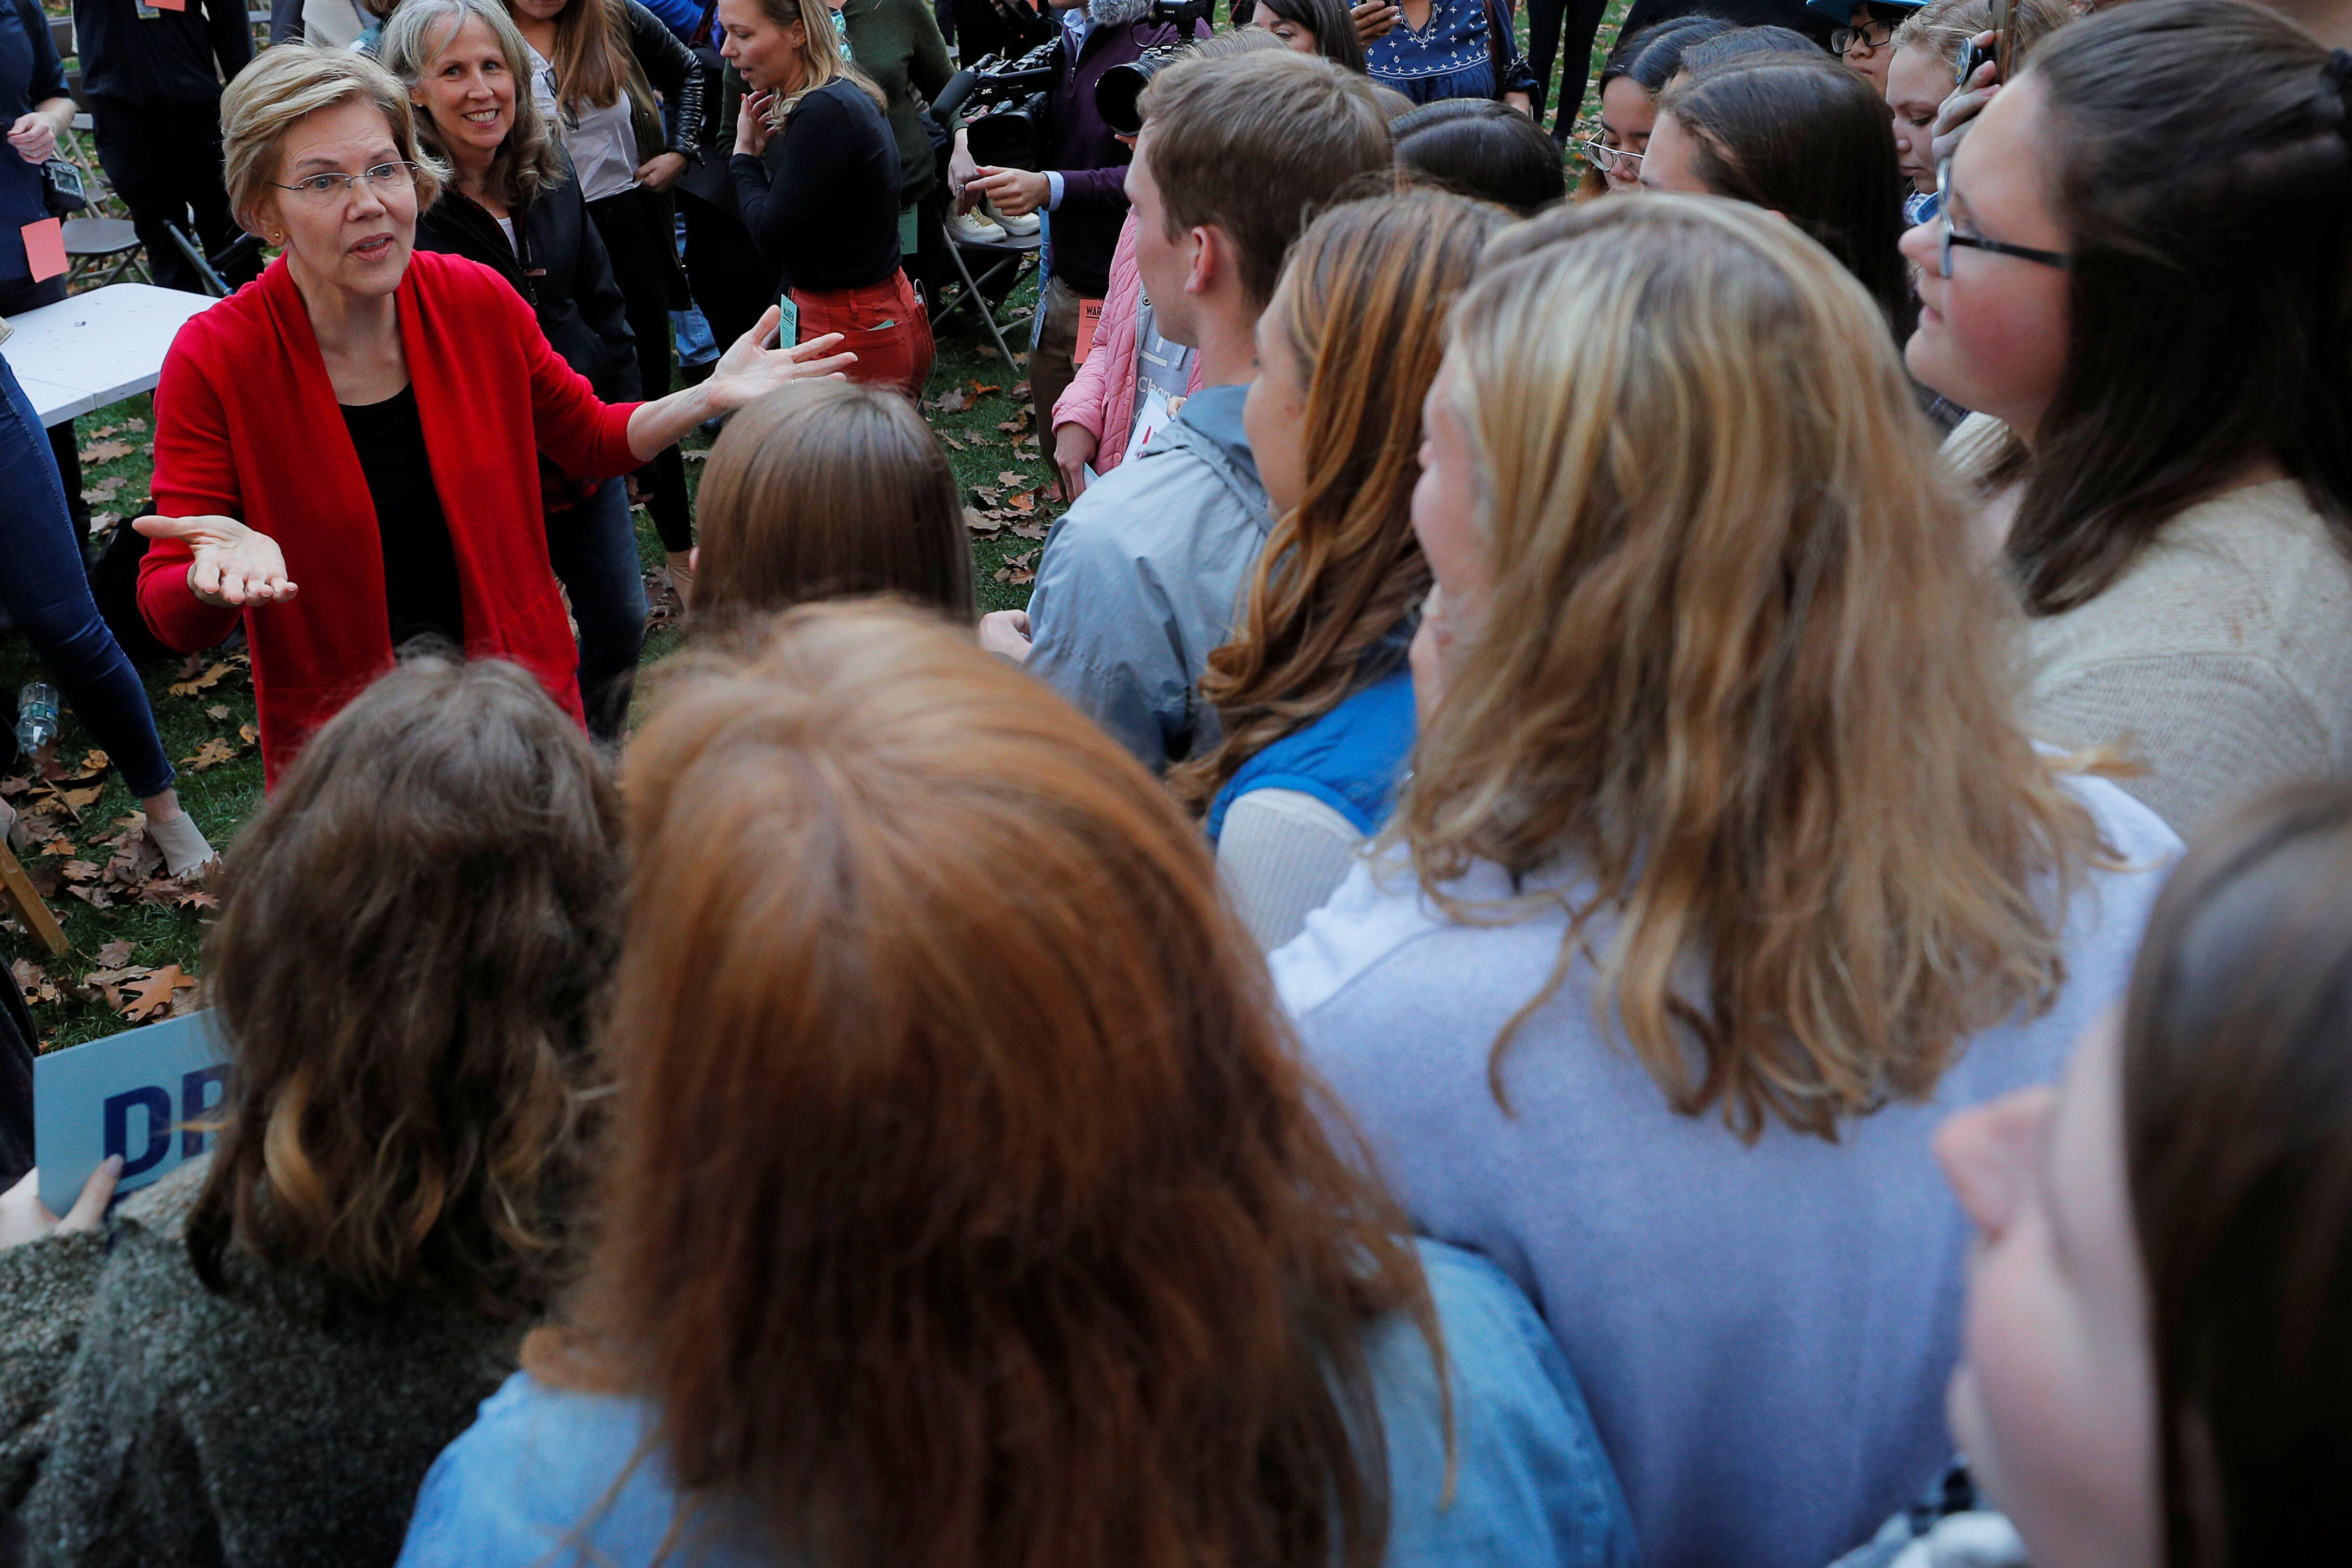 Democratic 2020 U.S. presidential candidate and Sen. Elizabeth Warren (D-Mass.) campaigns at Dartmouth College in Hanover, Ne